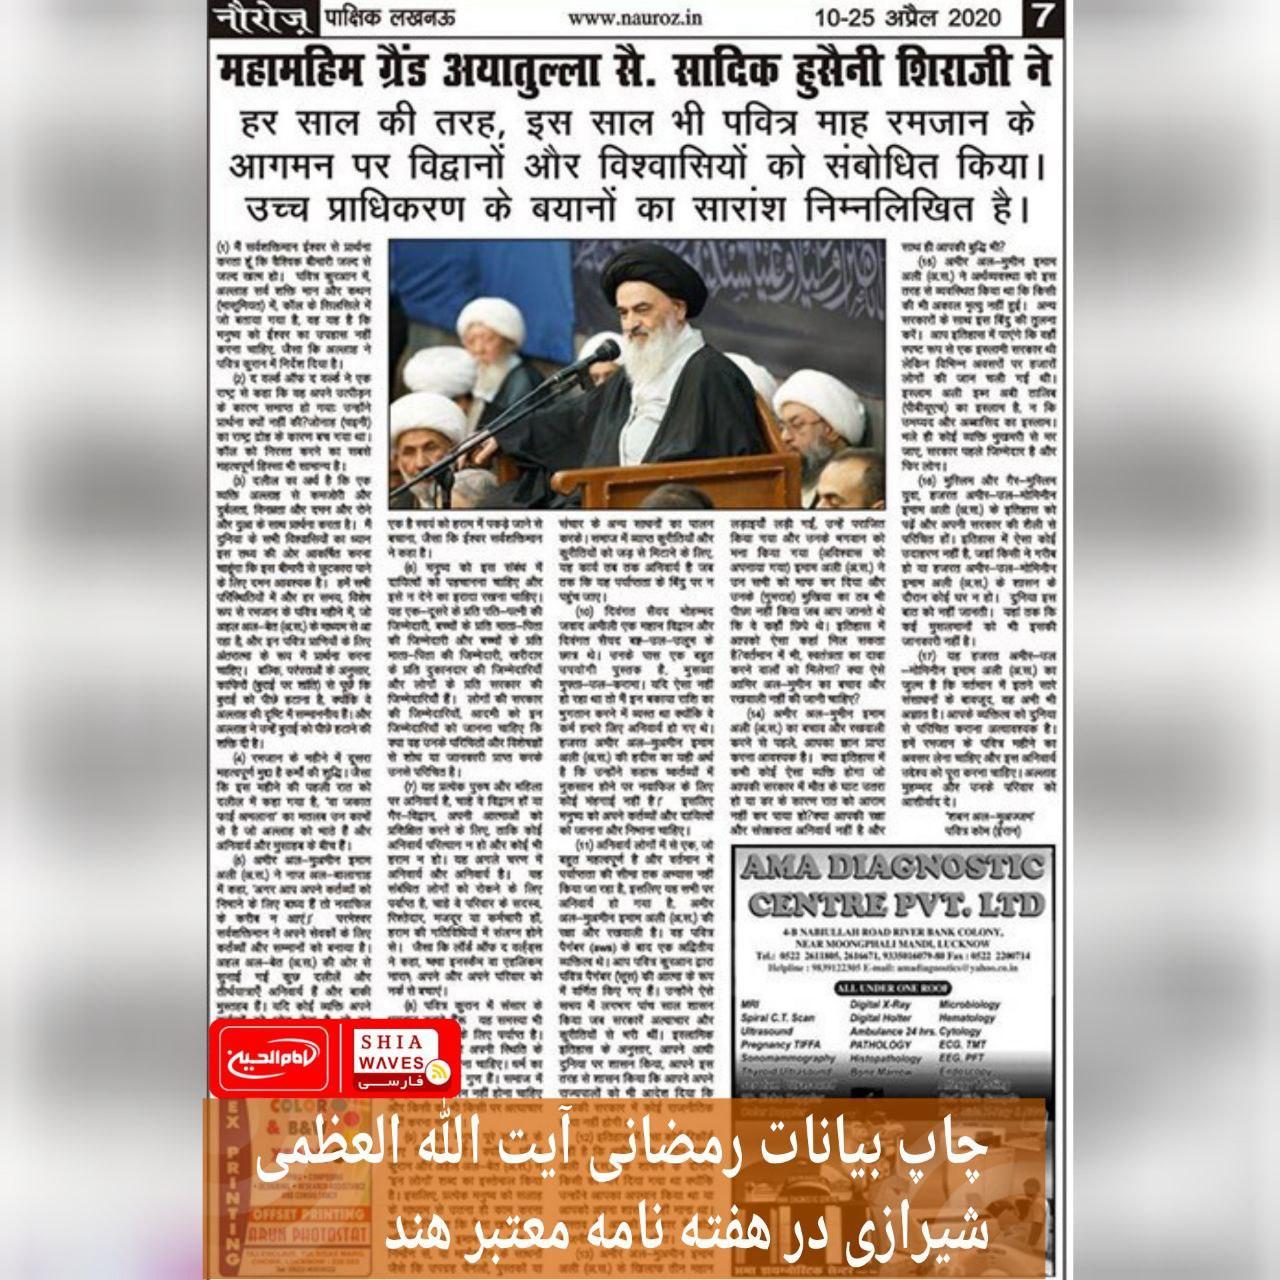 Photo of چاپ بیانات رمضانی آیت الله العظمی شیرازی در هفته نامه معتبر هند